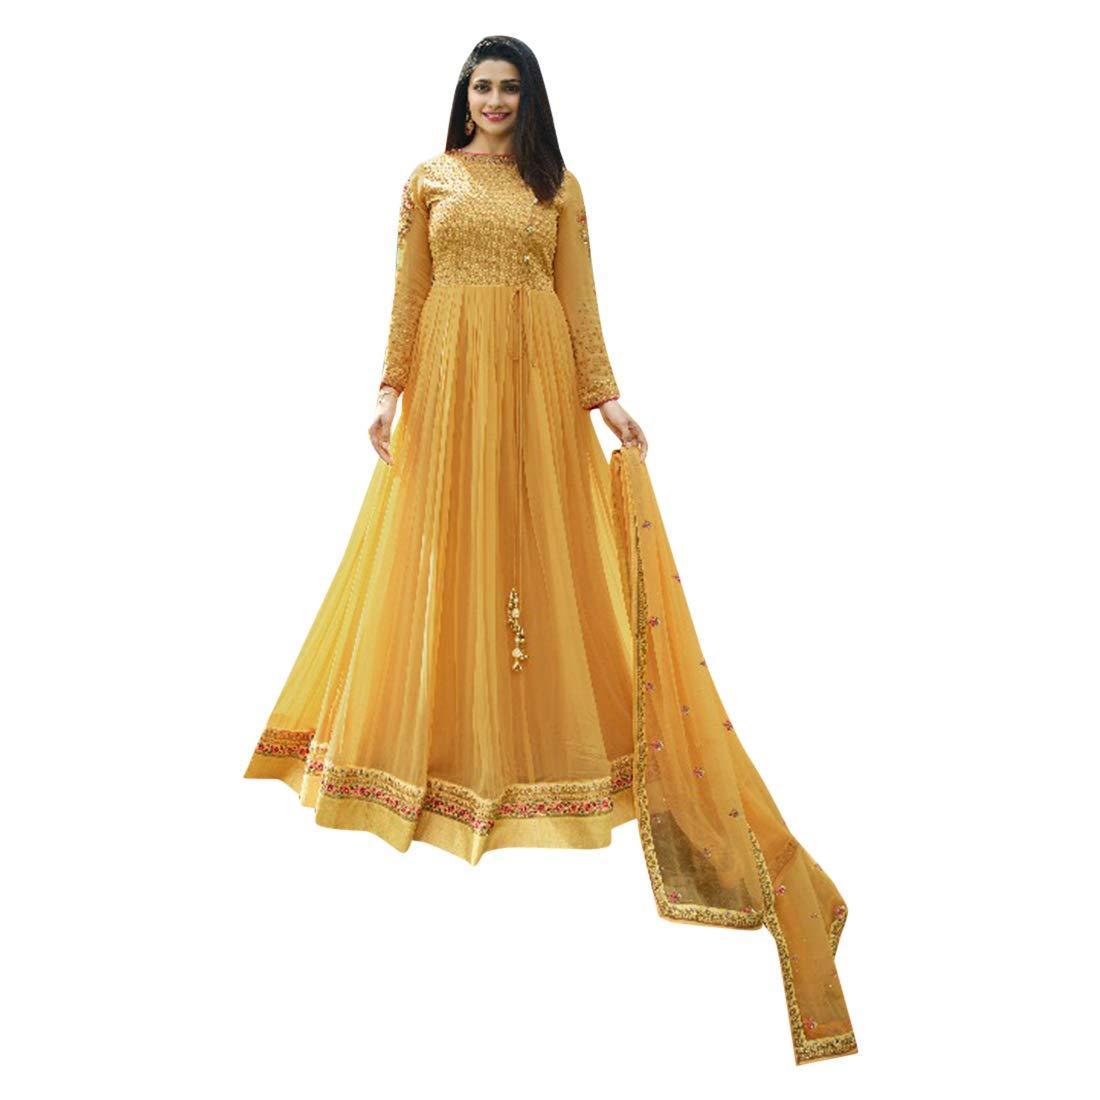 Amazon.com: Anarkali Salwar Kameez - Traje con flores ...